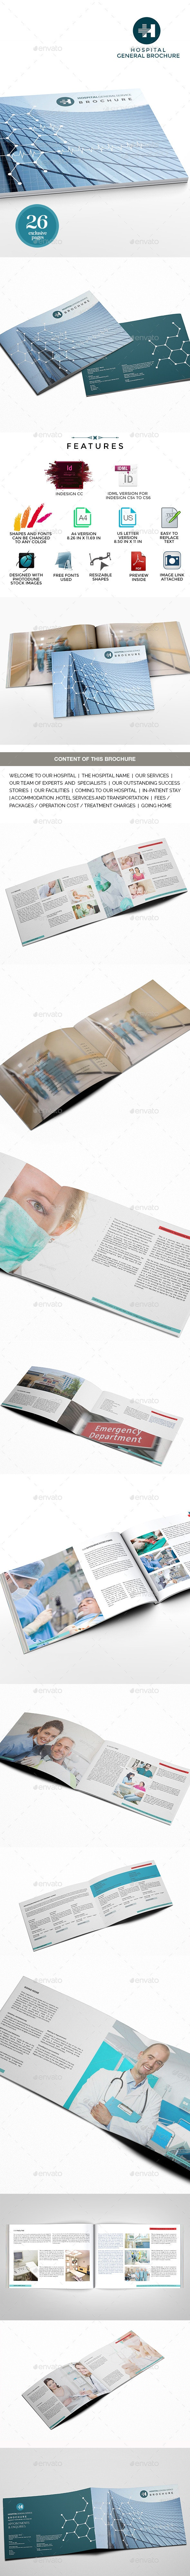 Hospitals Landscape General Brochure Template  - Corporate Brochures